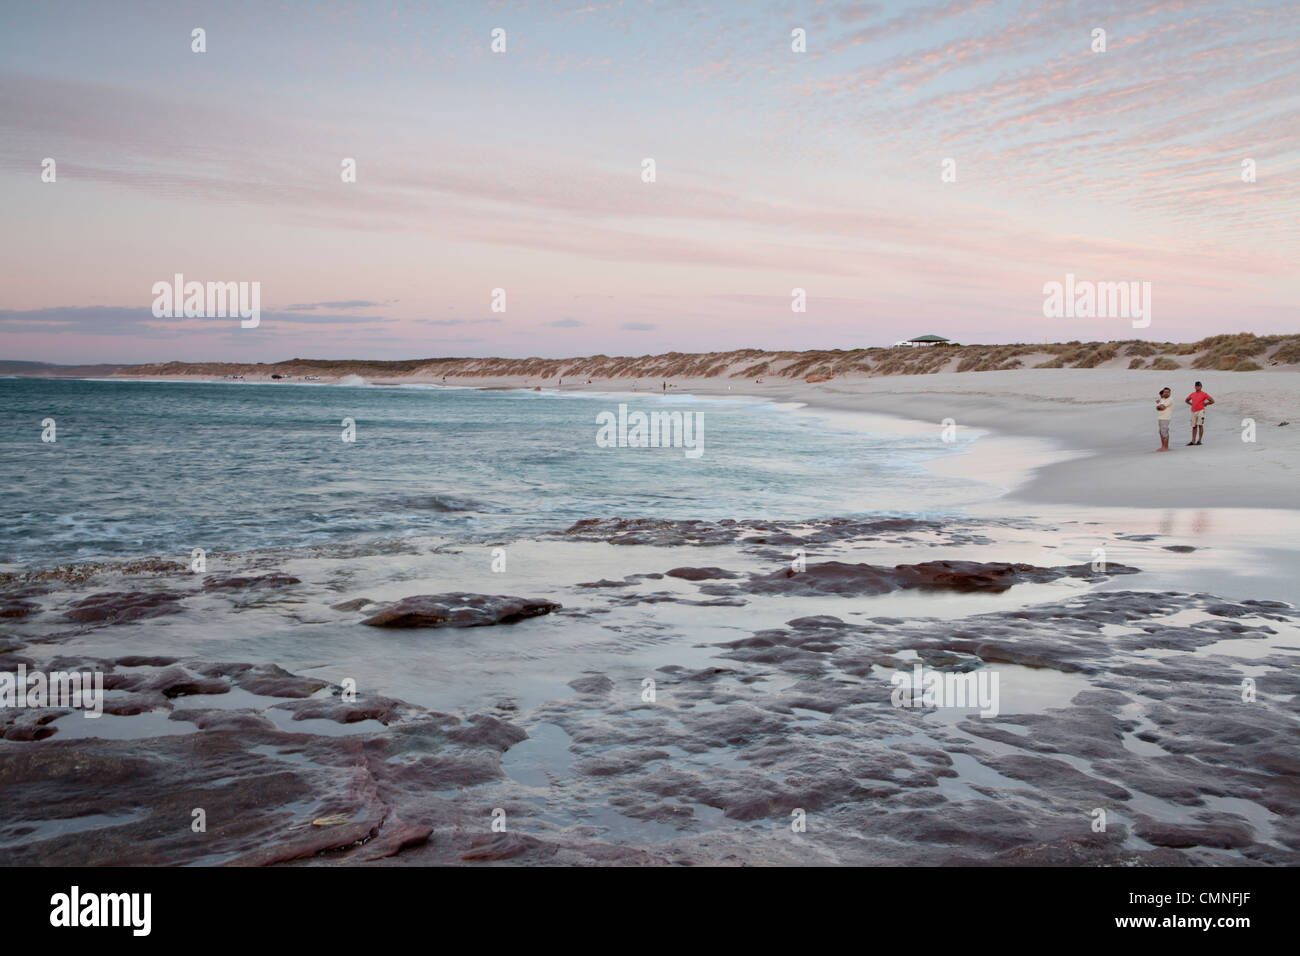 Sunset at Red Bluff Beach, Kalbarri, Western Australia - Stock Image